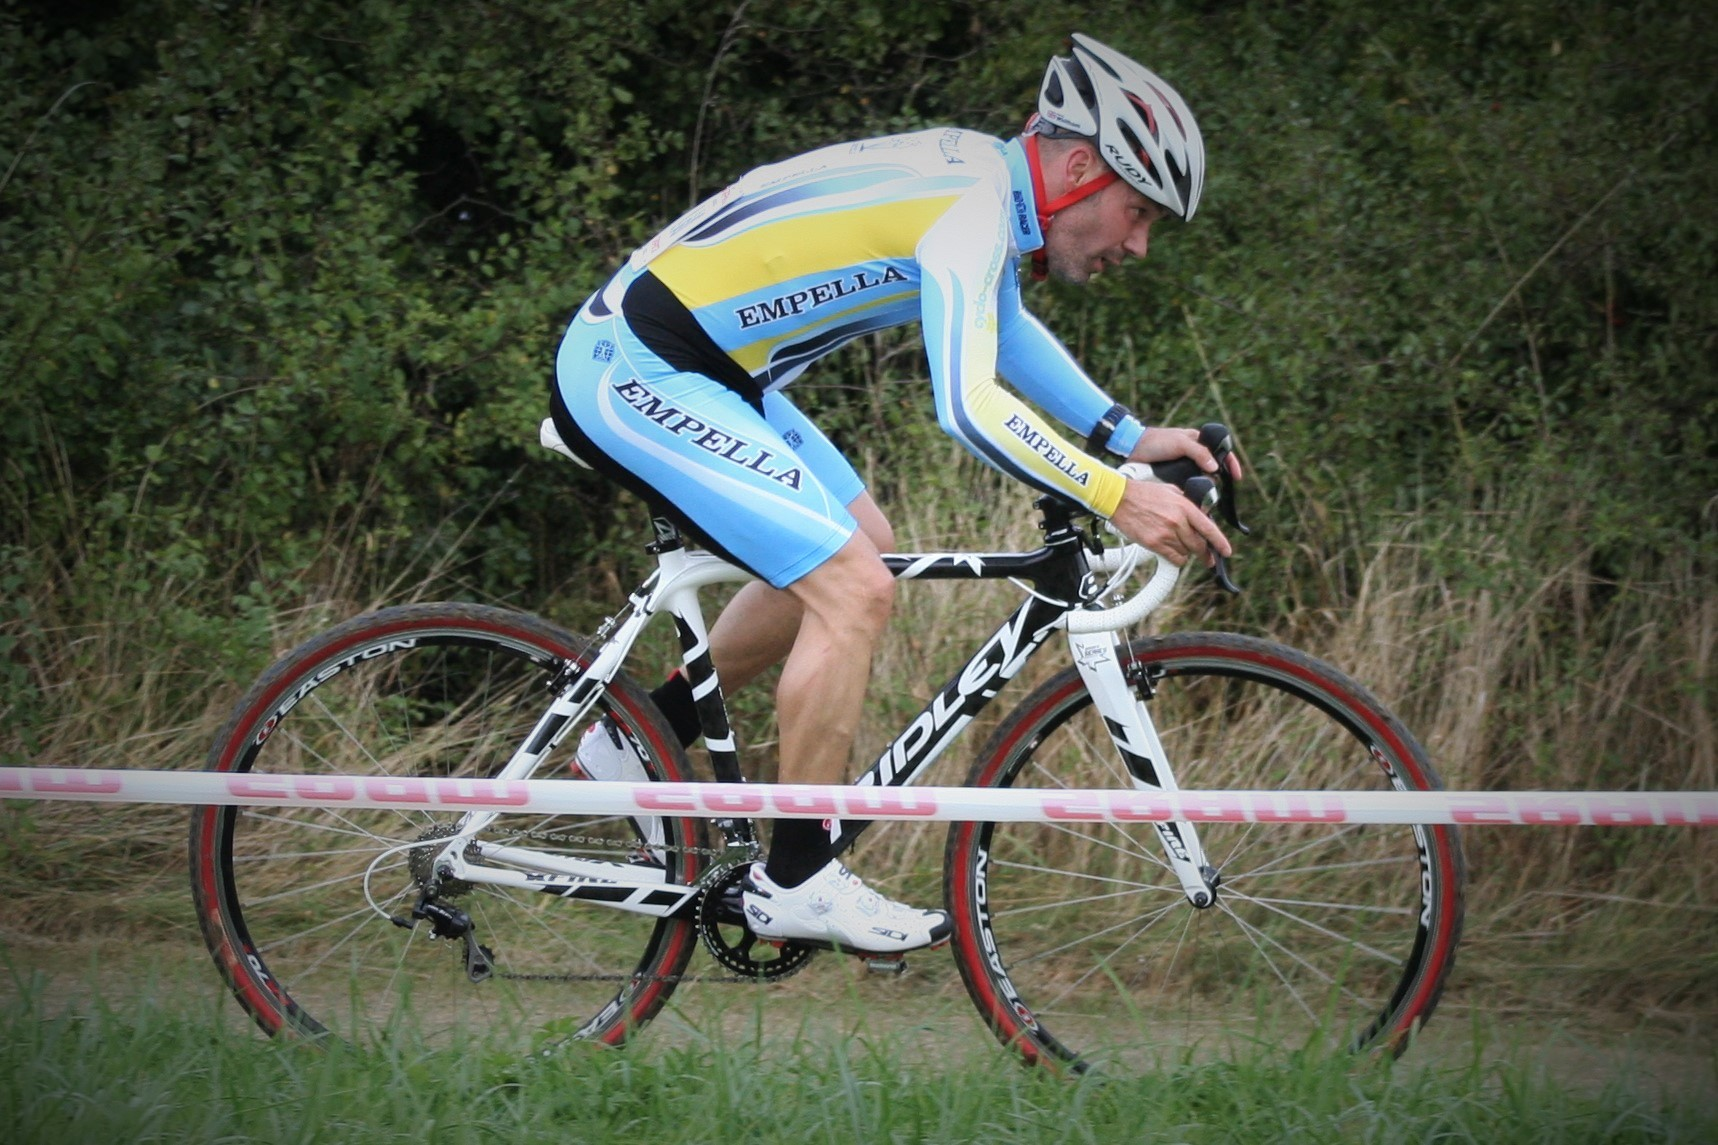 Empella, Cyclo-Cross, NDCXL, Simon Whitham